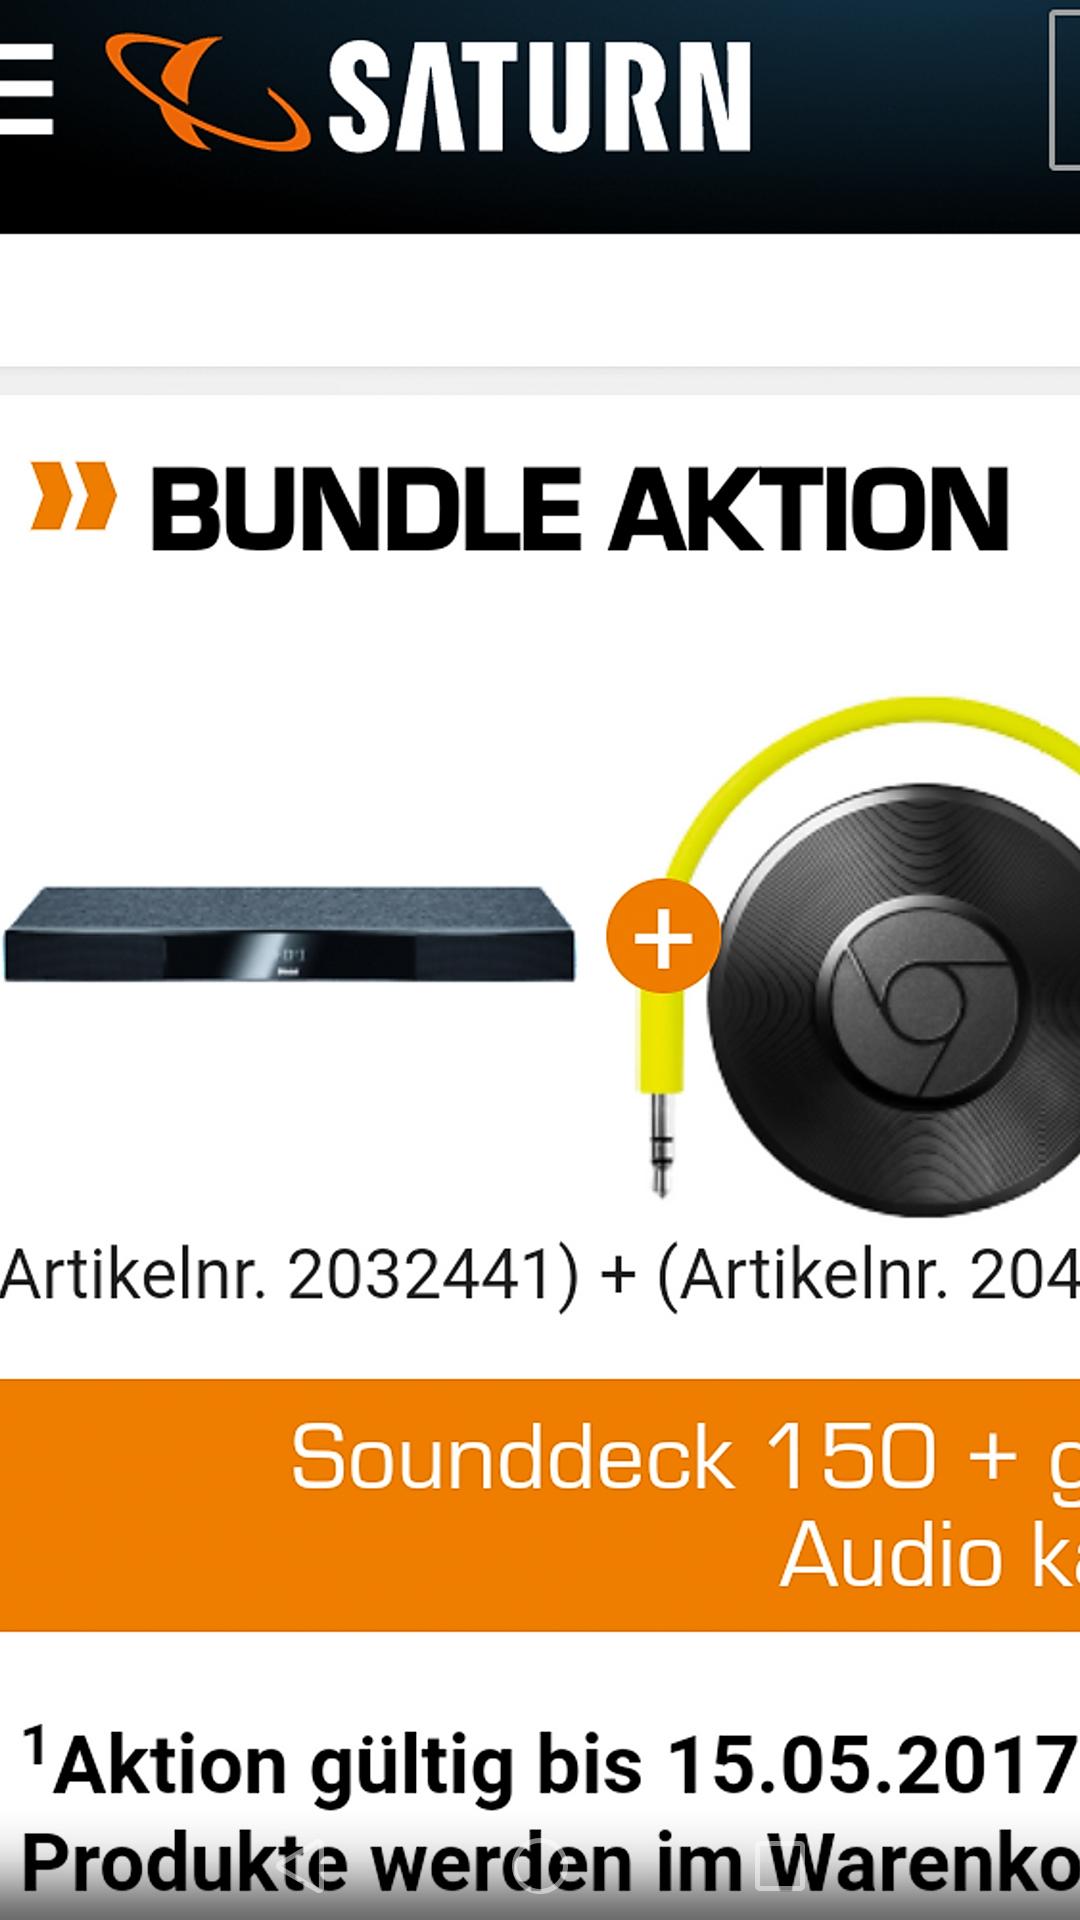 MAGNAT SOUNDDECK 150, SOUNDDECK, 200 WATT, BLUETOOTH, SCHWARZ  + Google chromecast audio gratis , saturn (abholung / 1,99 versand)